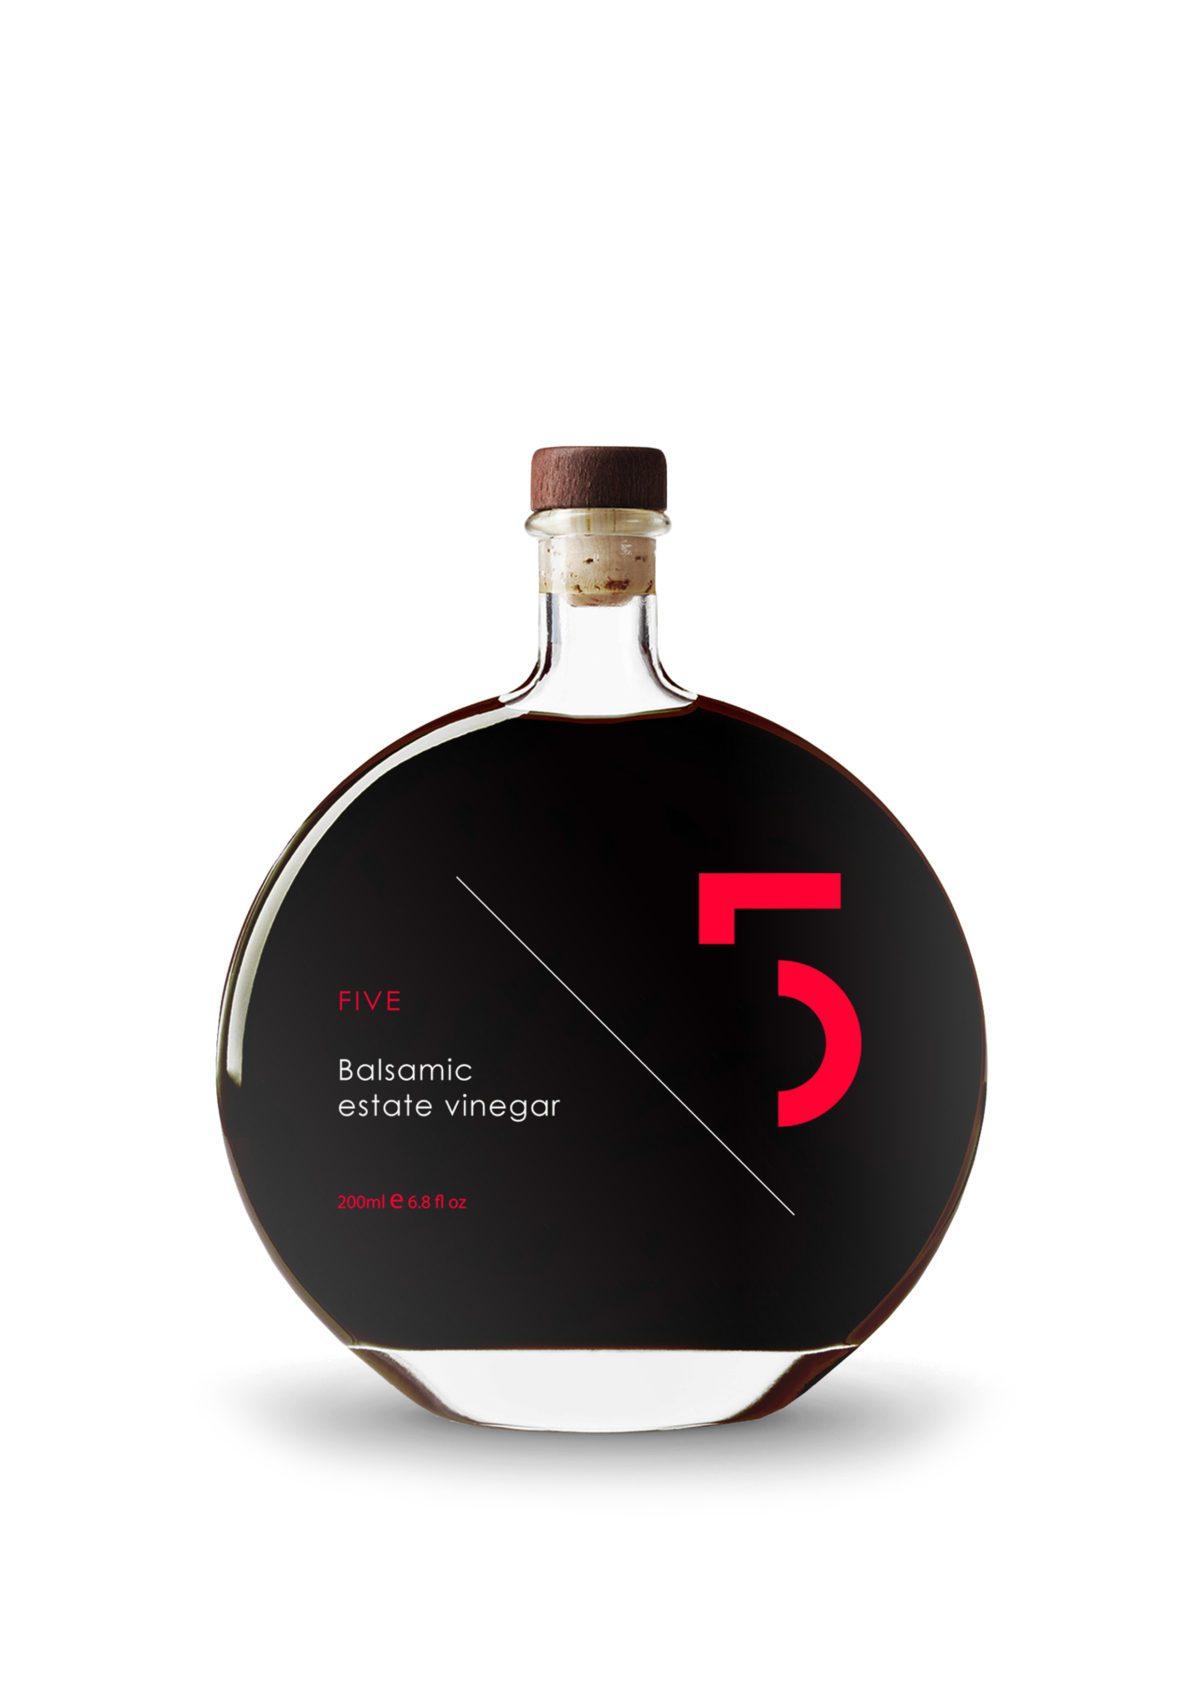 Five Balsamic Estate Vinegar Five Olive Oil In The Pursuit Cooking